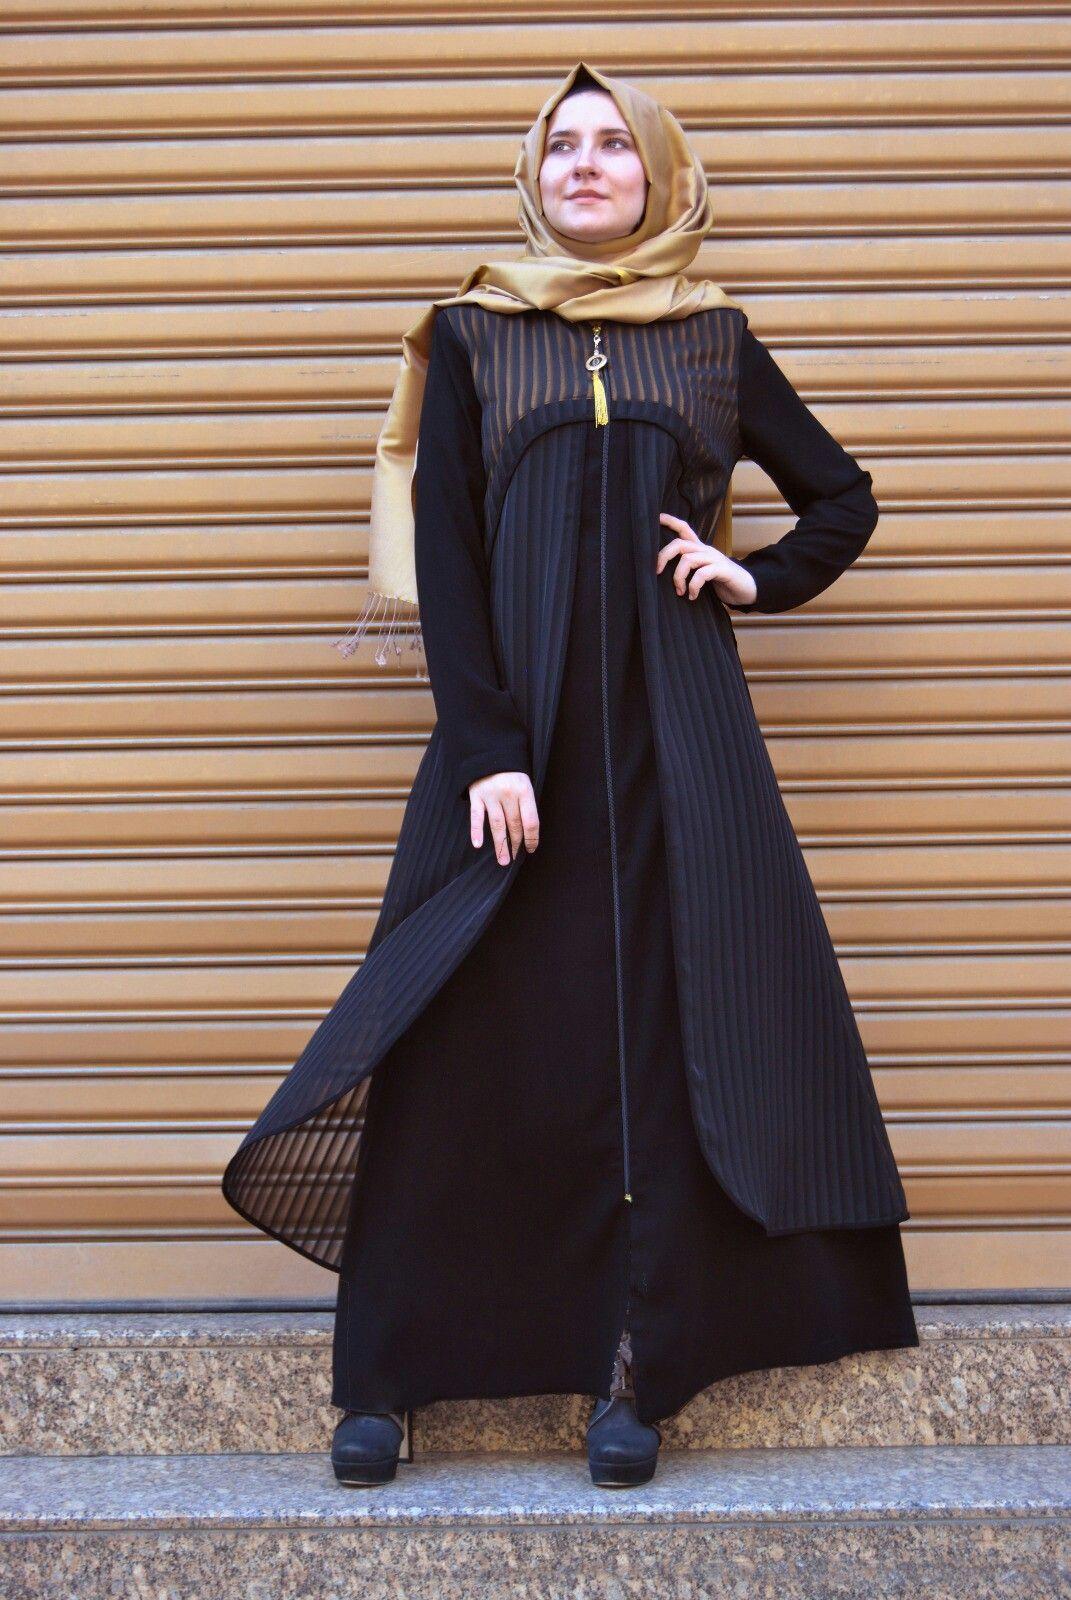 Banu begüm black yellow dress tl or dolars information and